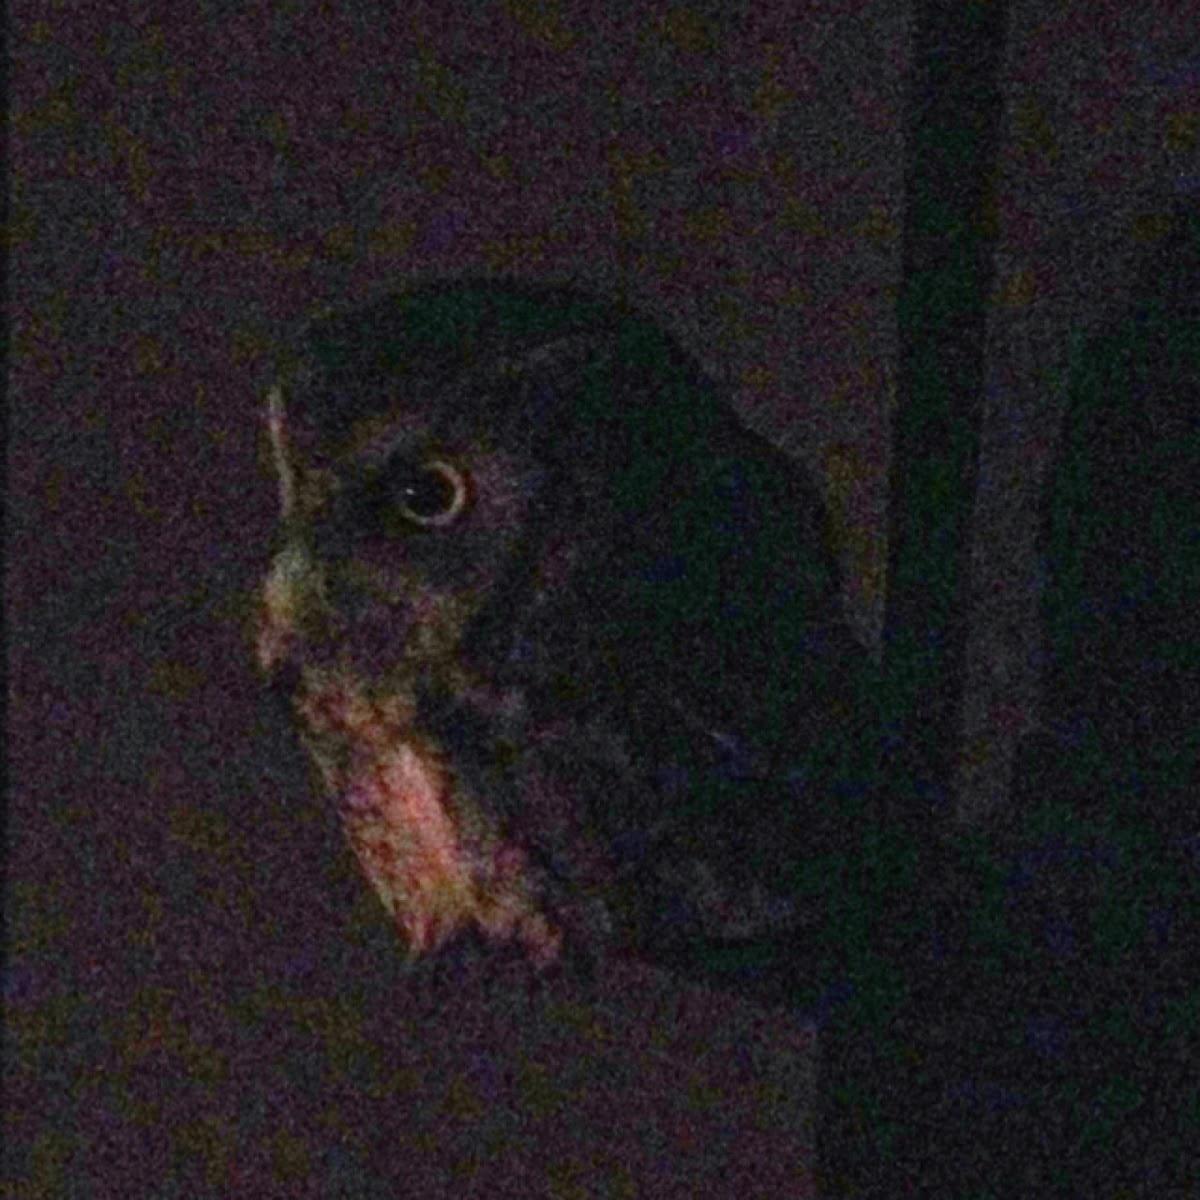 Eastern Screetch Owl